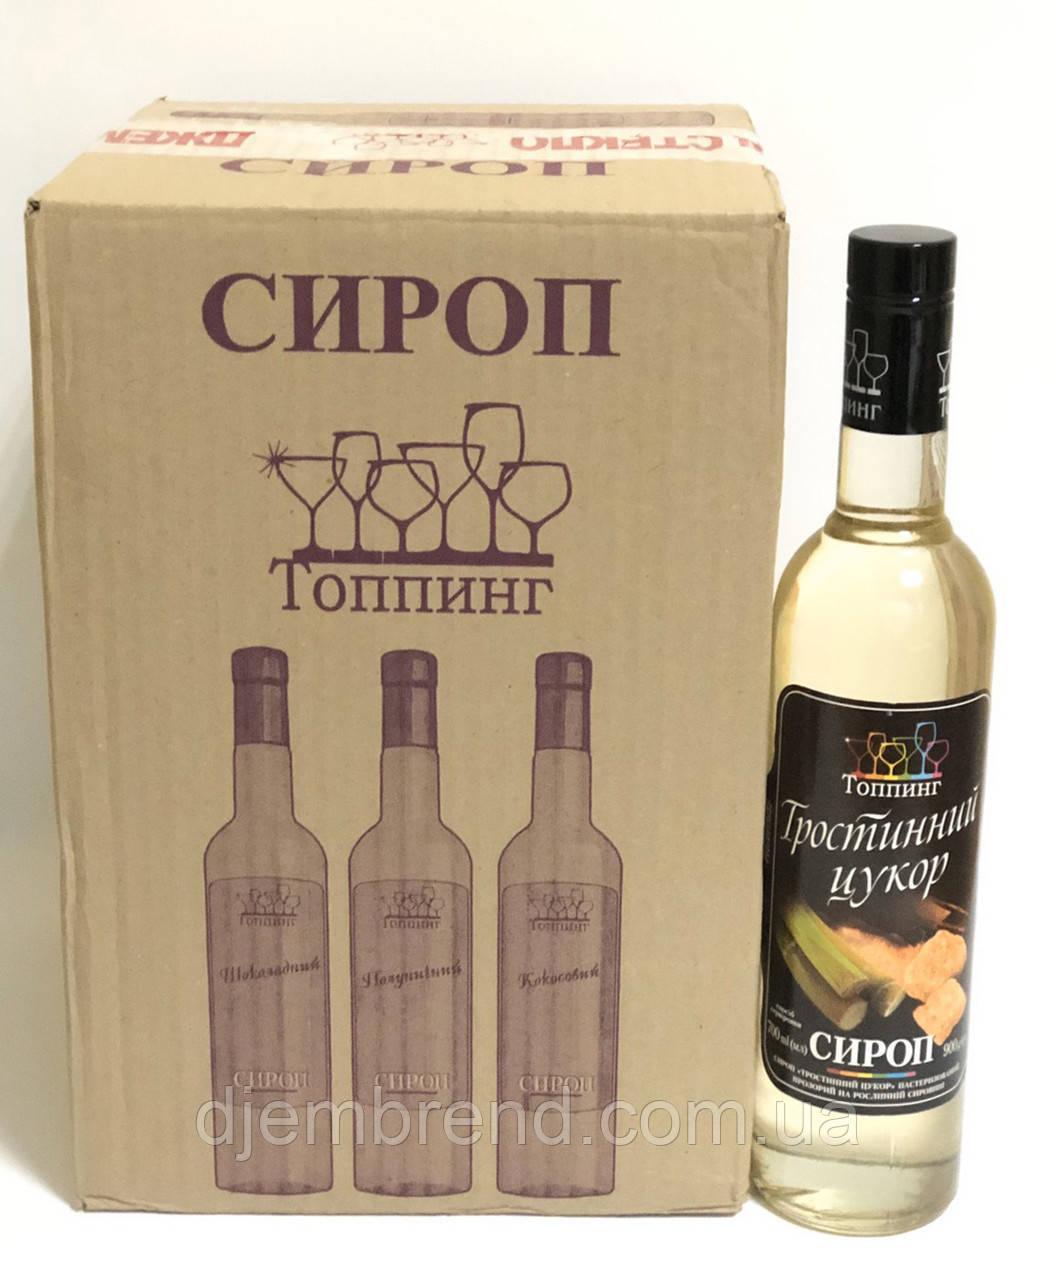 Сироп Белый шоколад ТМ Топпинг, коробка 9 шт. Цена 59 грн/шт.